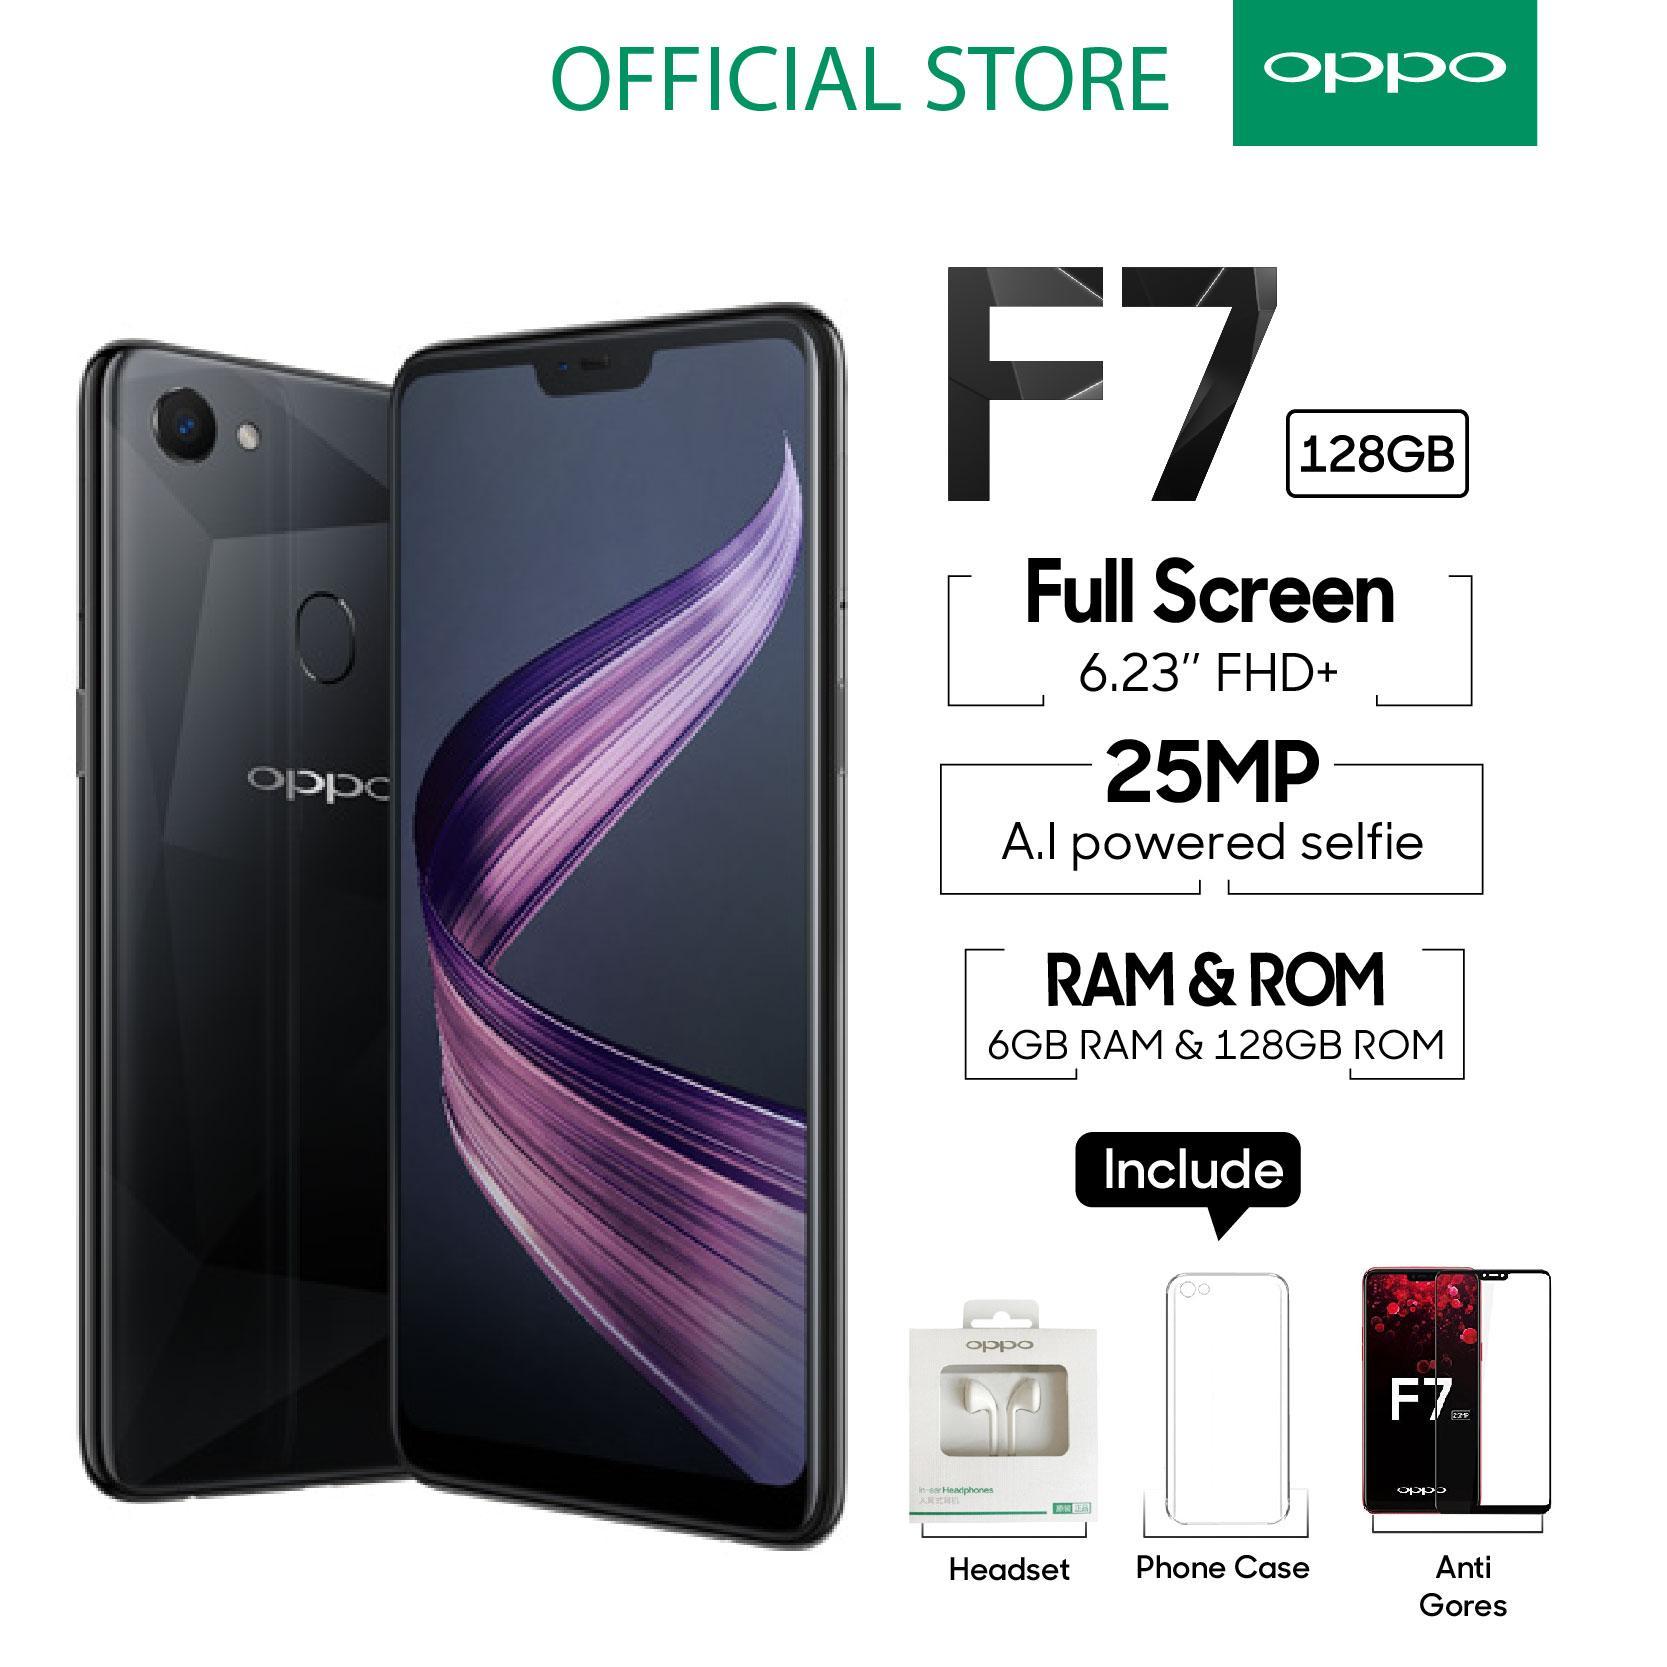 OPPO F7 Smartphone 25 MP Ai Camera 6GB/128GB Black -  (Cicilan TANPA Kartu Kredit, Garansi Resmi OPPO, Cicilan 0%)